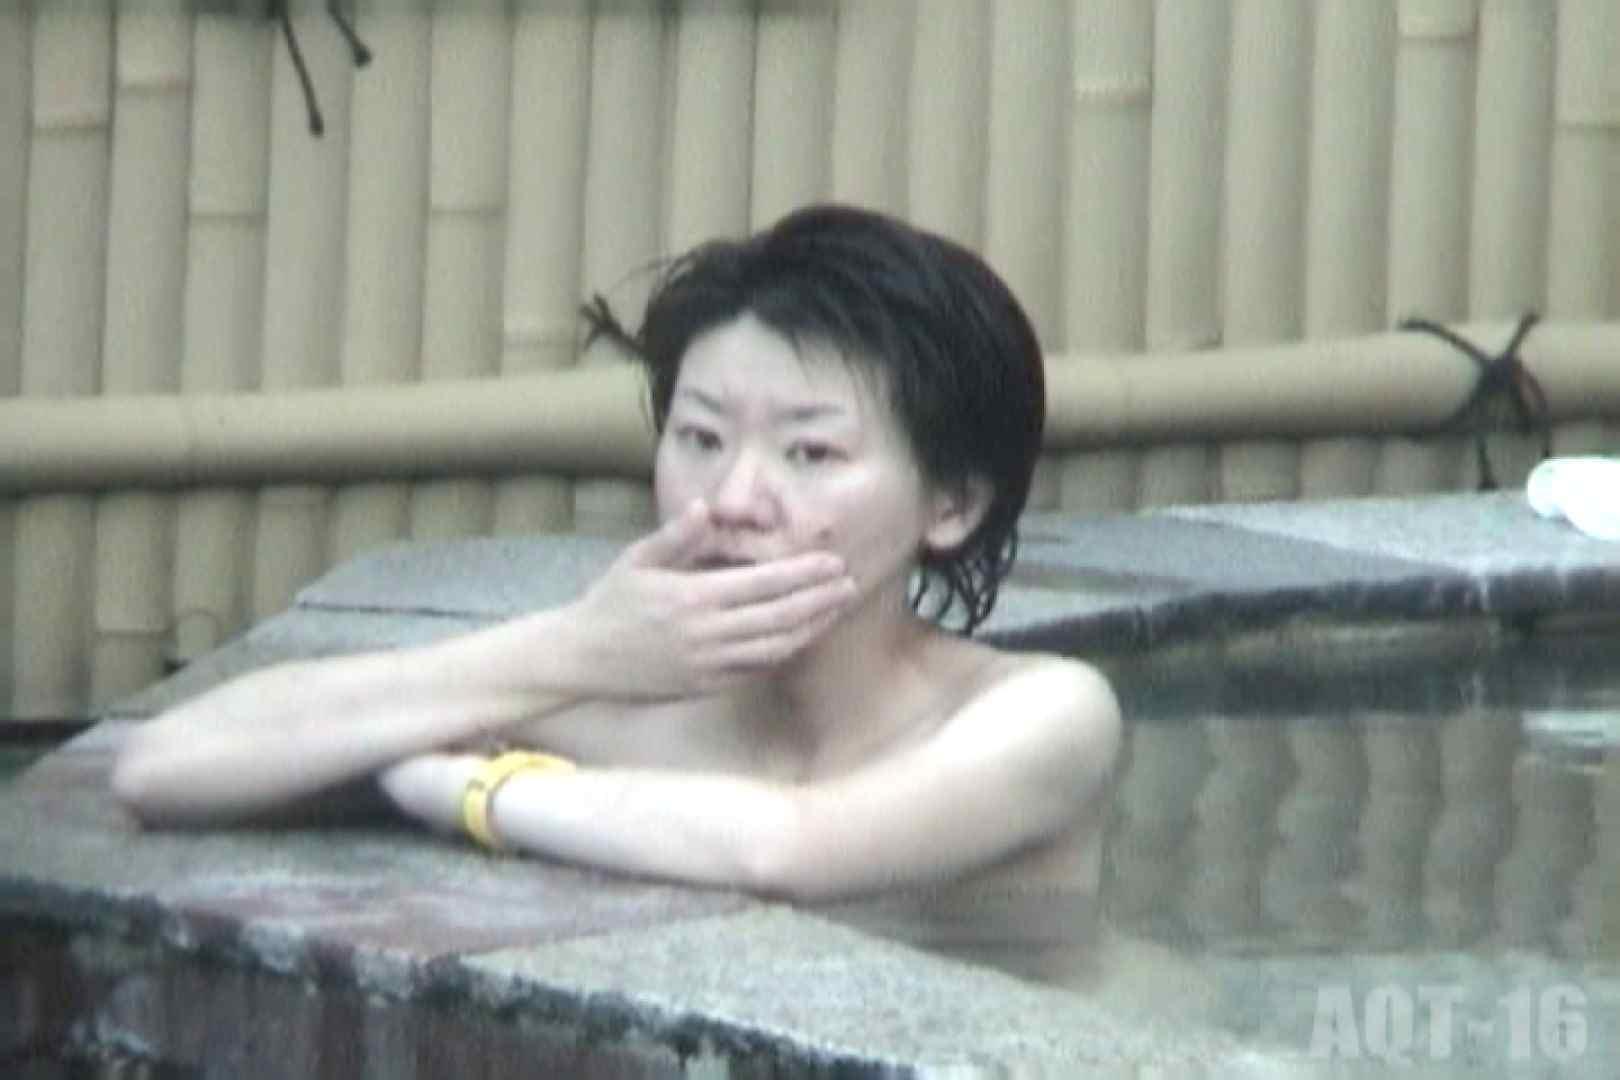 Aquaな露天風呂Vol.842 露天 オメコ無修正動画無料 44連発 41